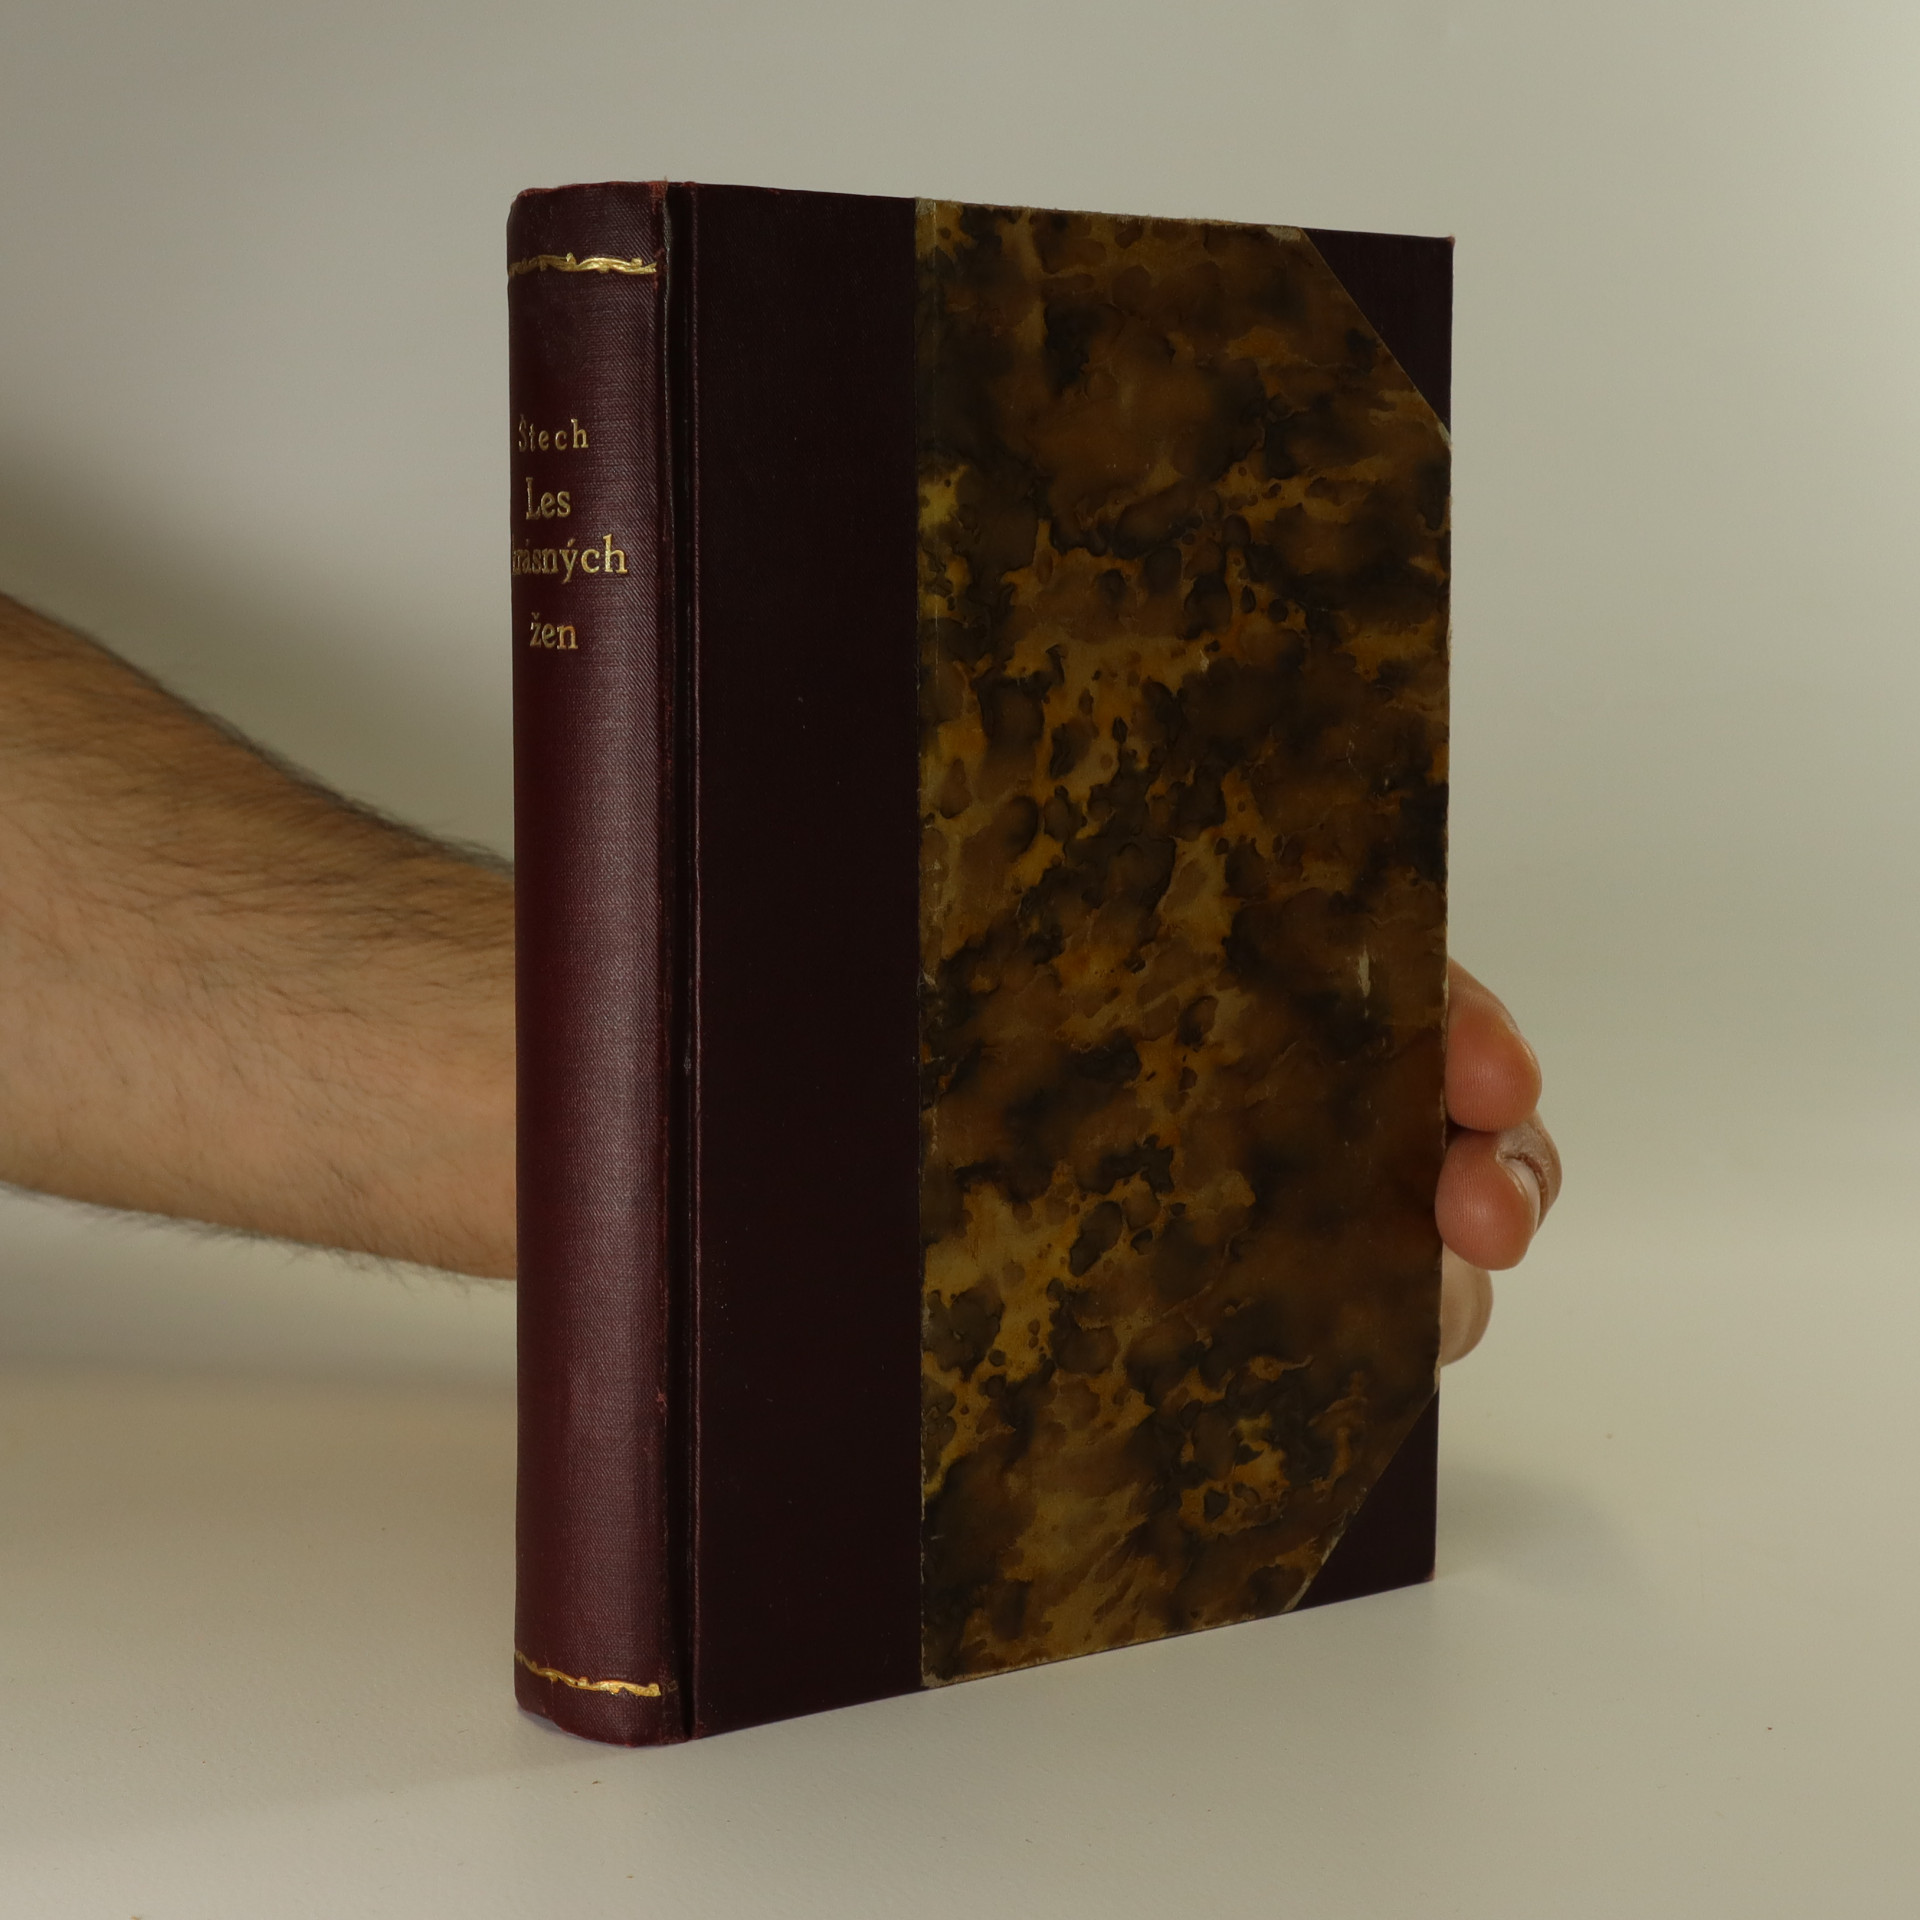 antikvární kniha Les krásných žen, 1925